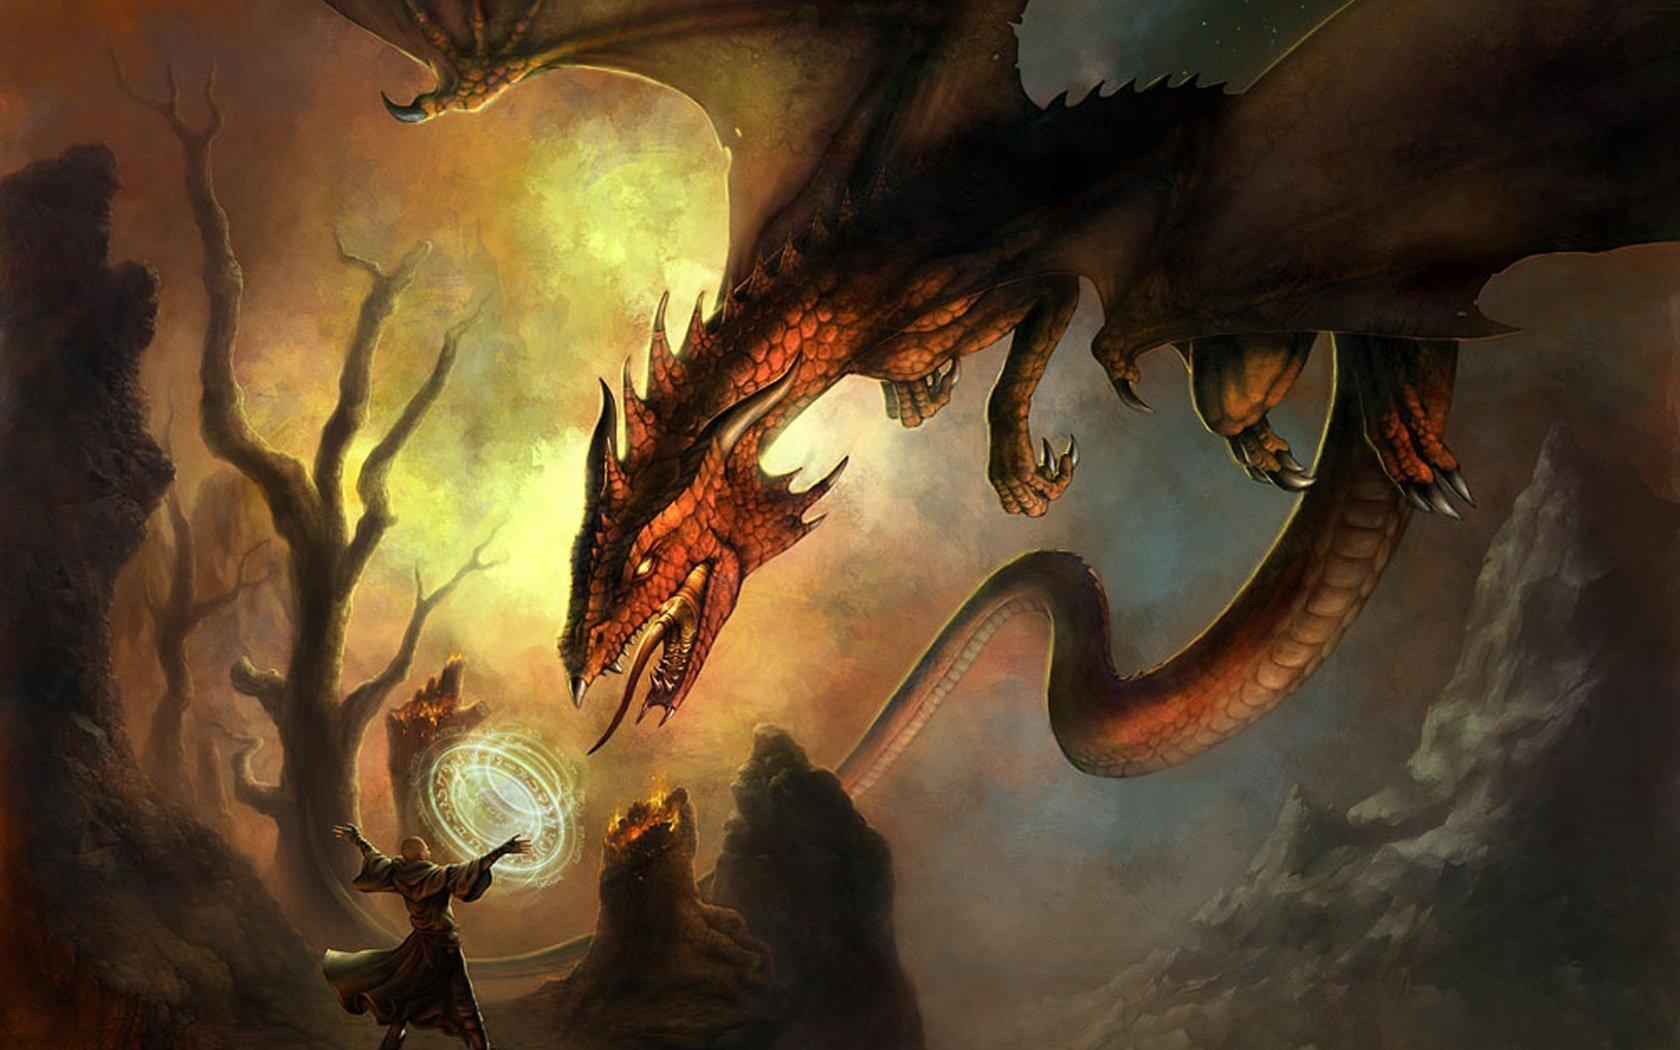 奇幻 - 巫师  龙 战争 壁纸